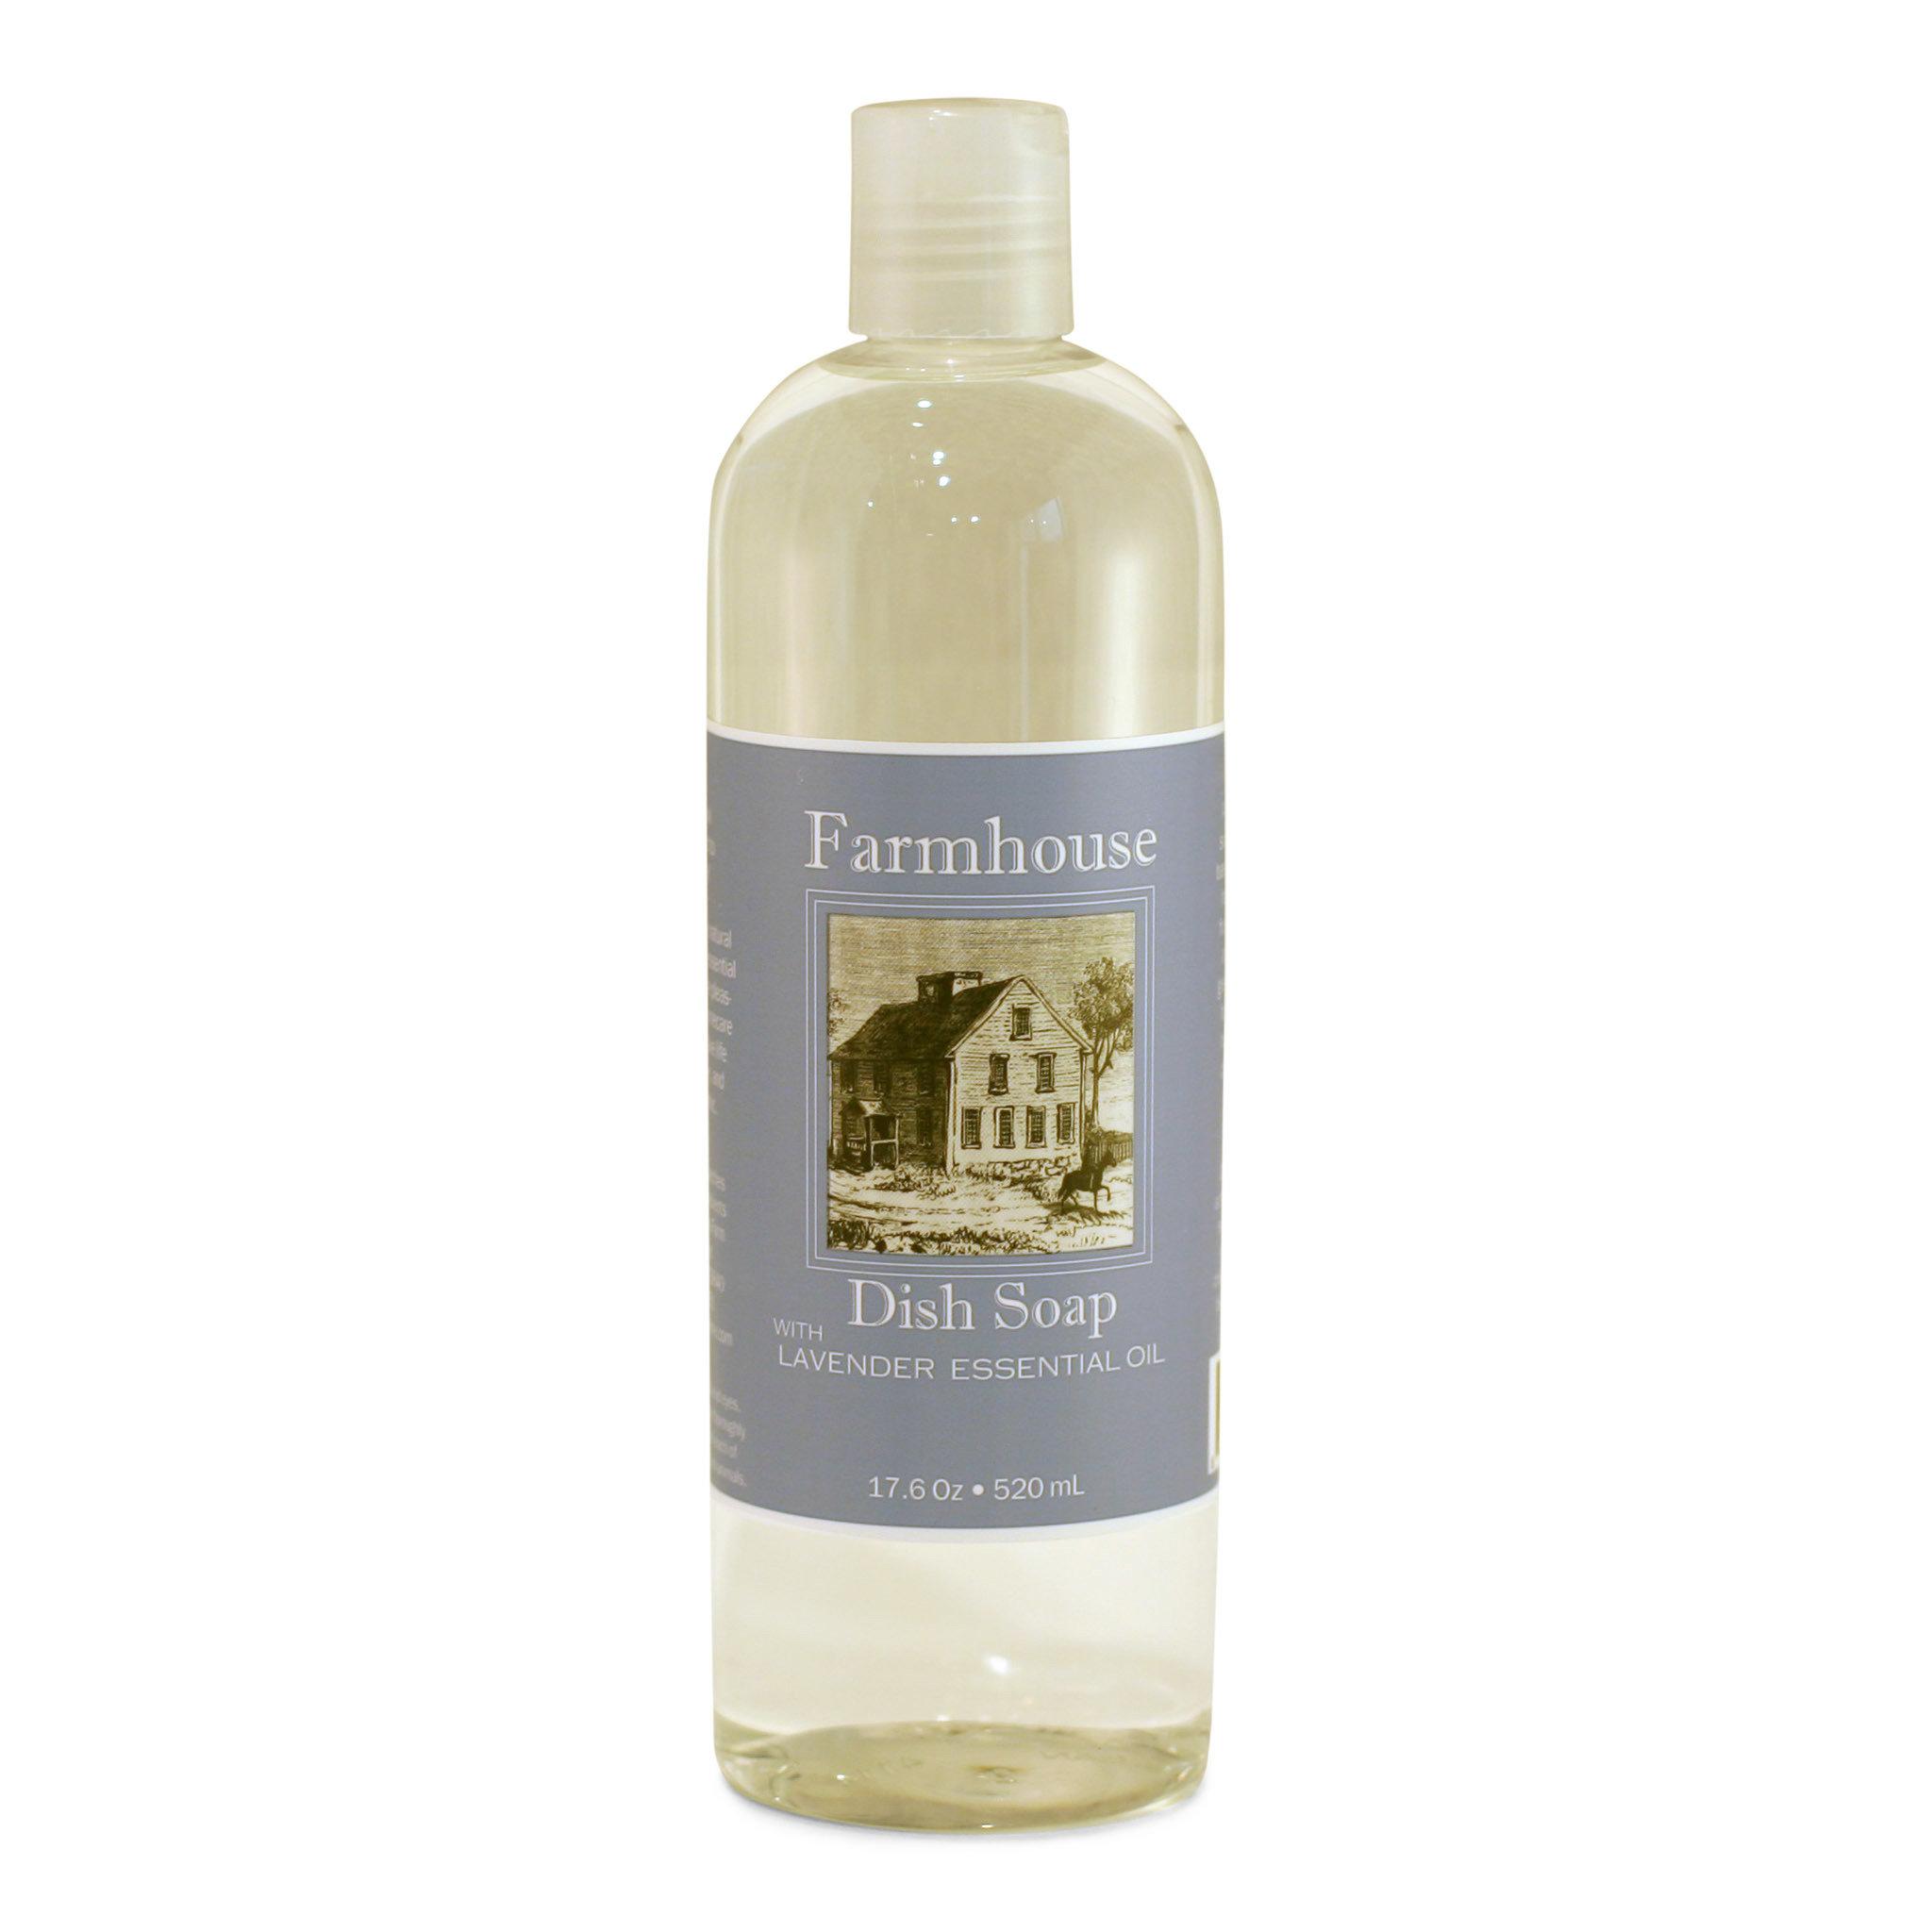 Farmhouse Lavender Dish Soap QSKPA4245PPQW